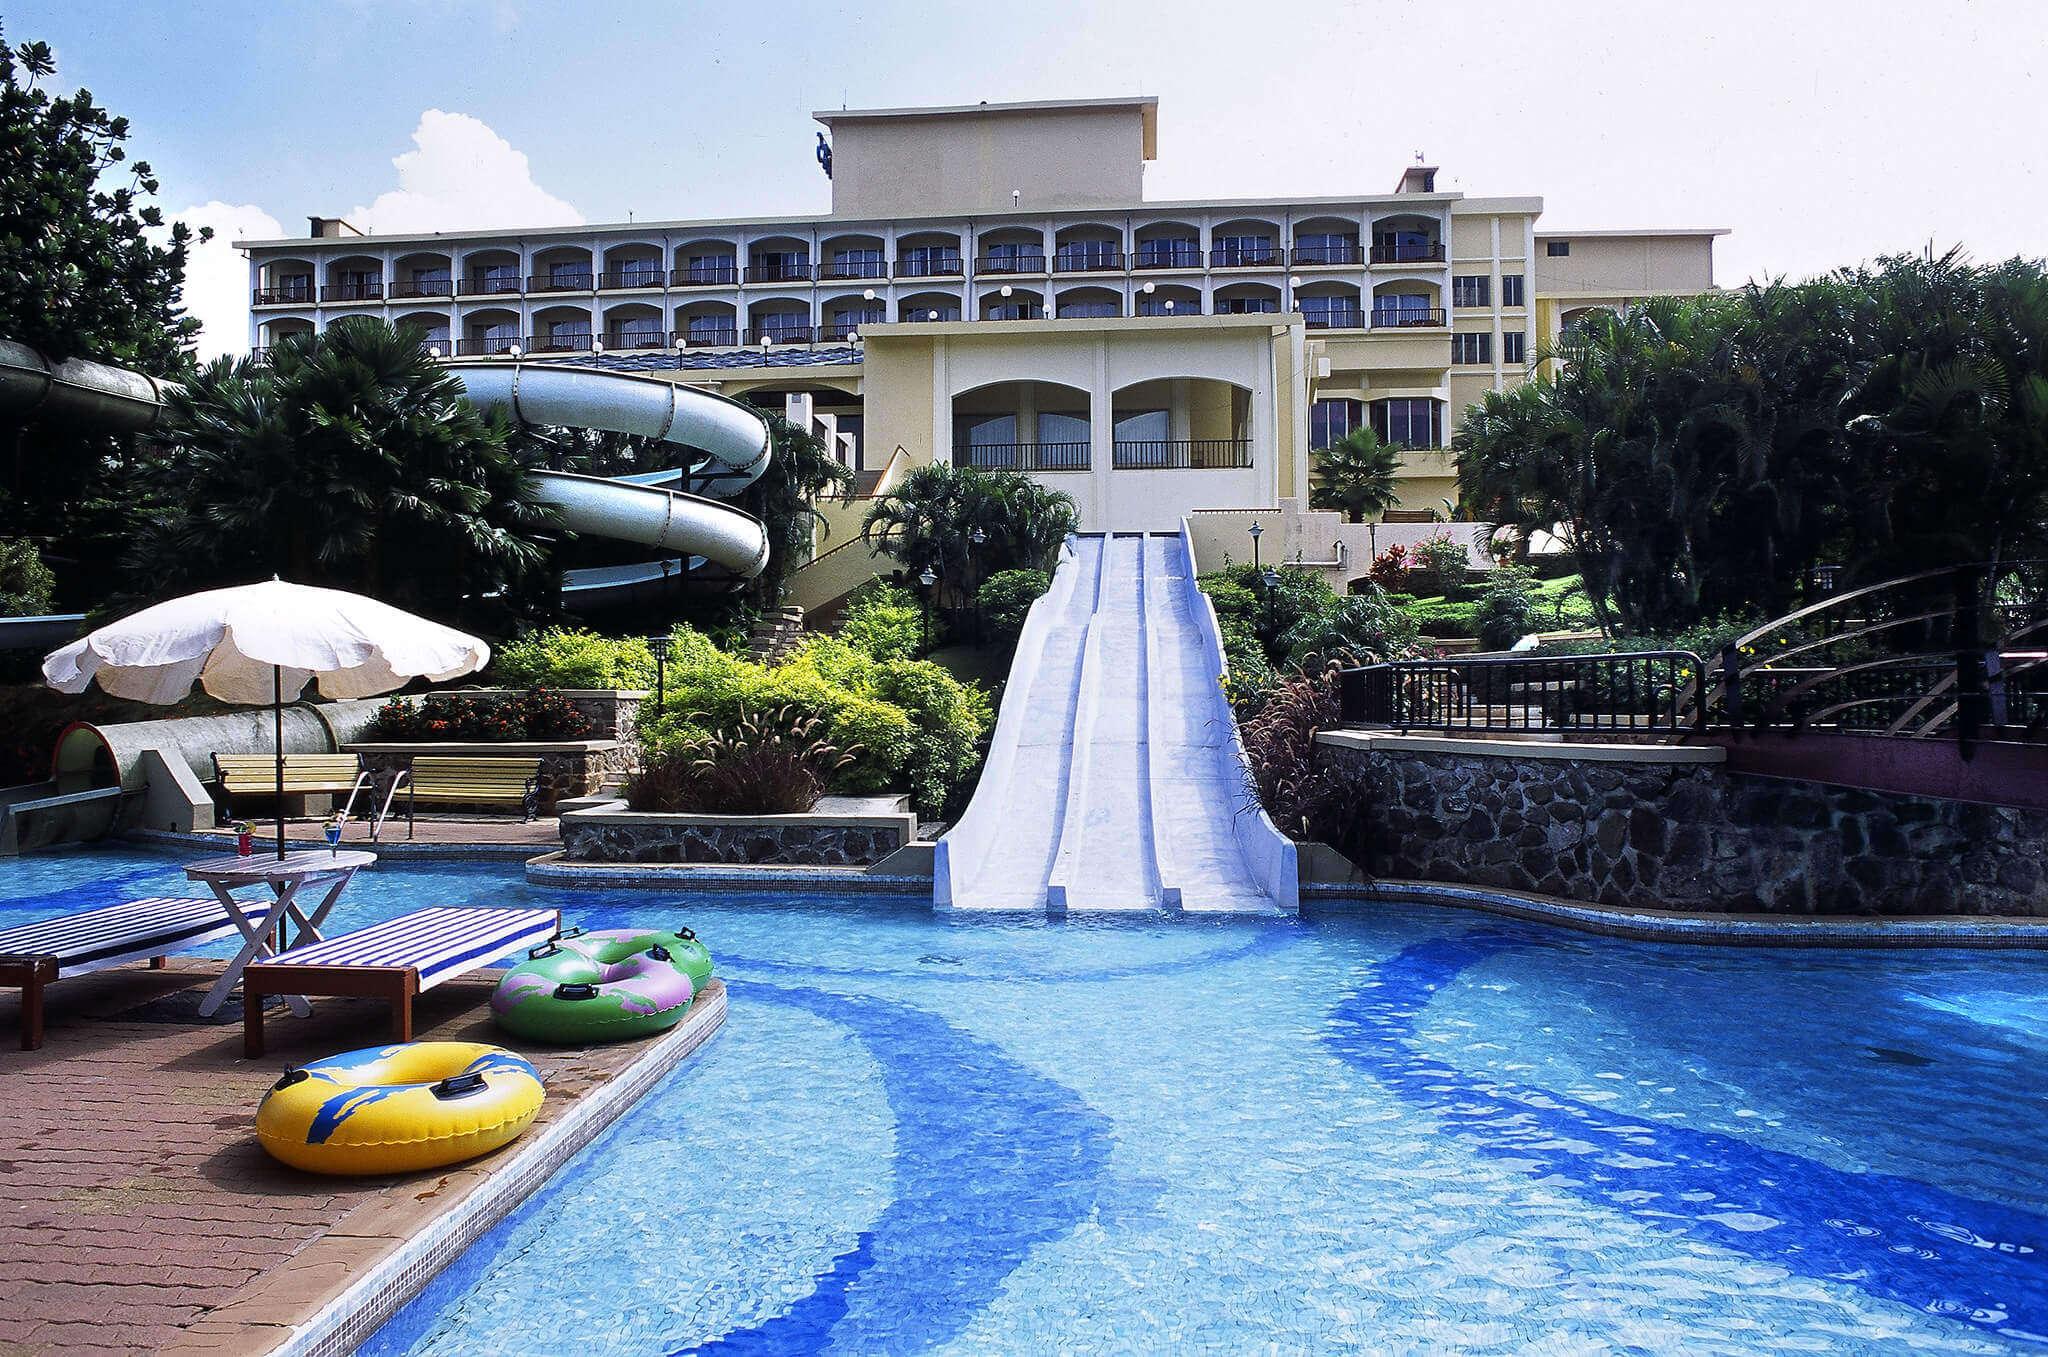 a water slider in a resort